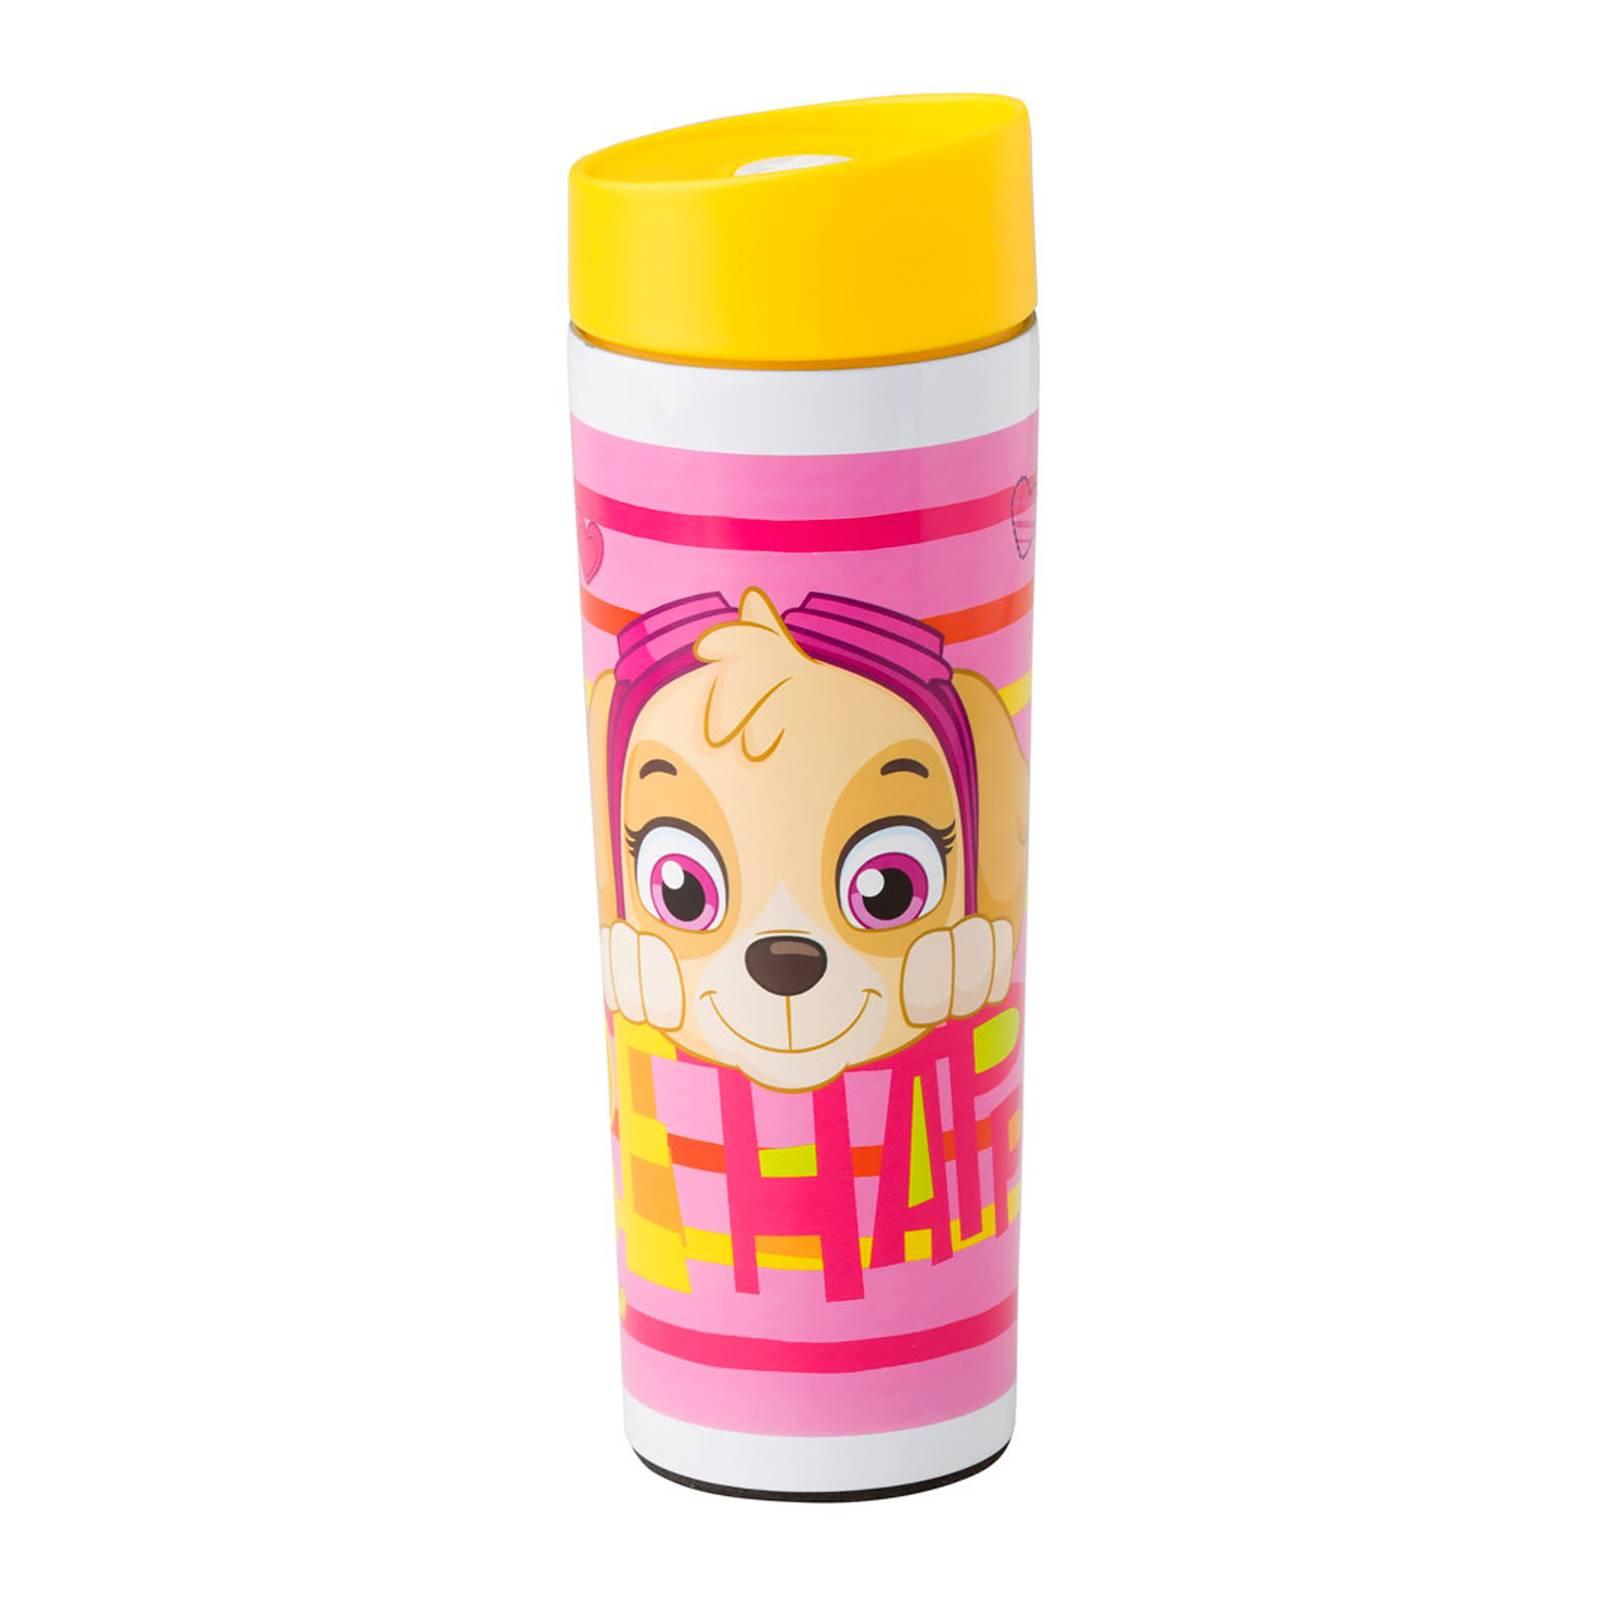 Kubek termiczny Psi Patrol Girls 400 ml NICKELODEON